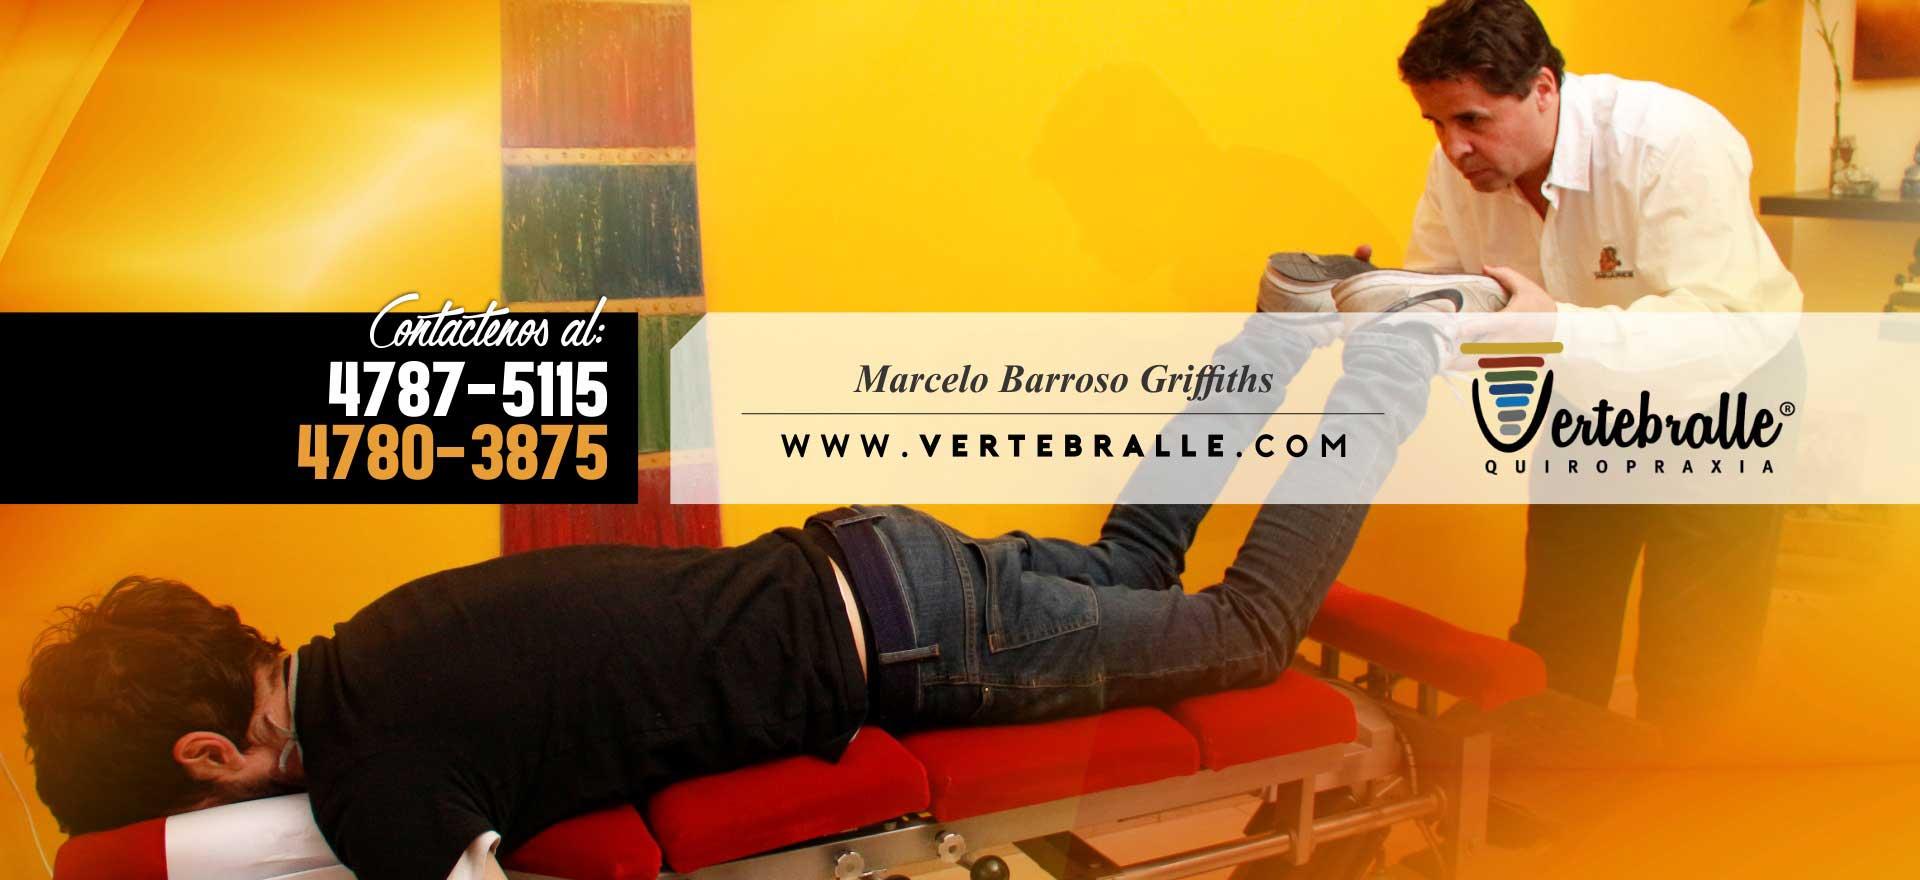 Vertebralle Quiropraxia - Marcelo Barroso Griffiths